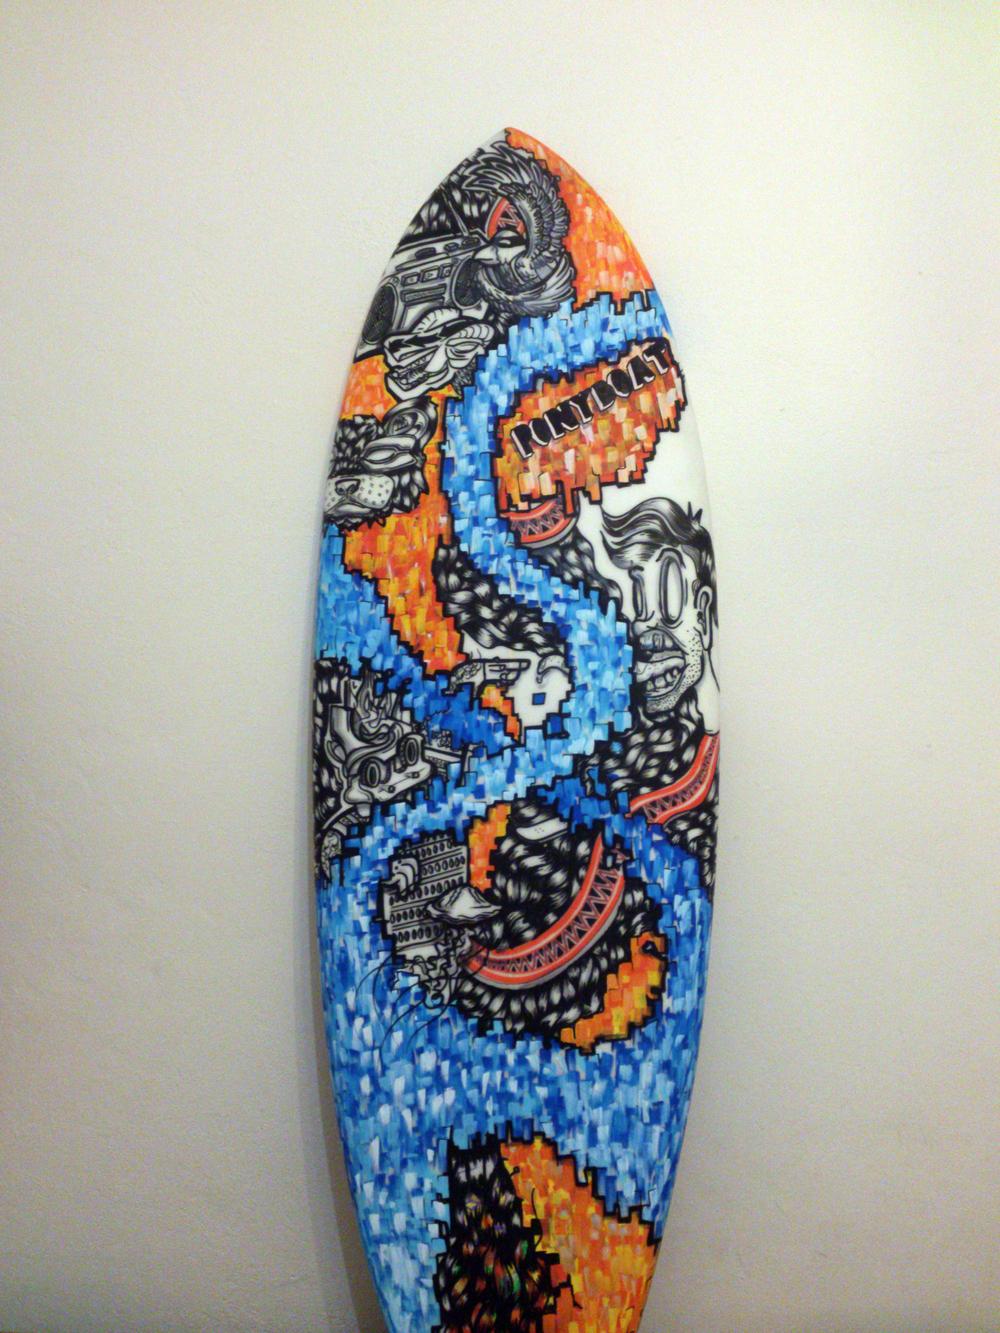 surfboard-surfing-surf-sam-shennan-custom-ud3-handmade-hand-painted-posca-design-sydney-artist-illustrator.jpg